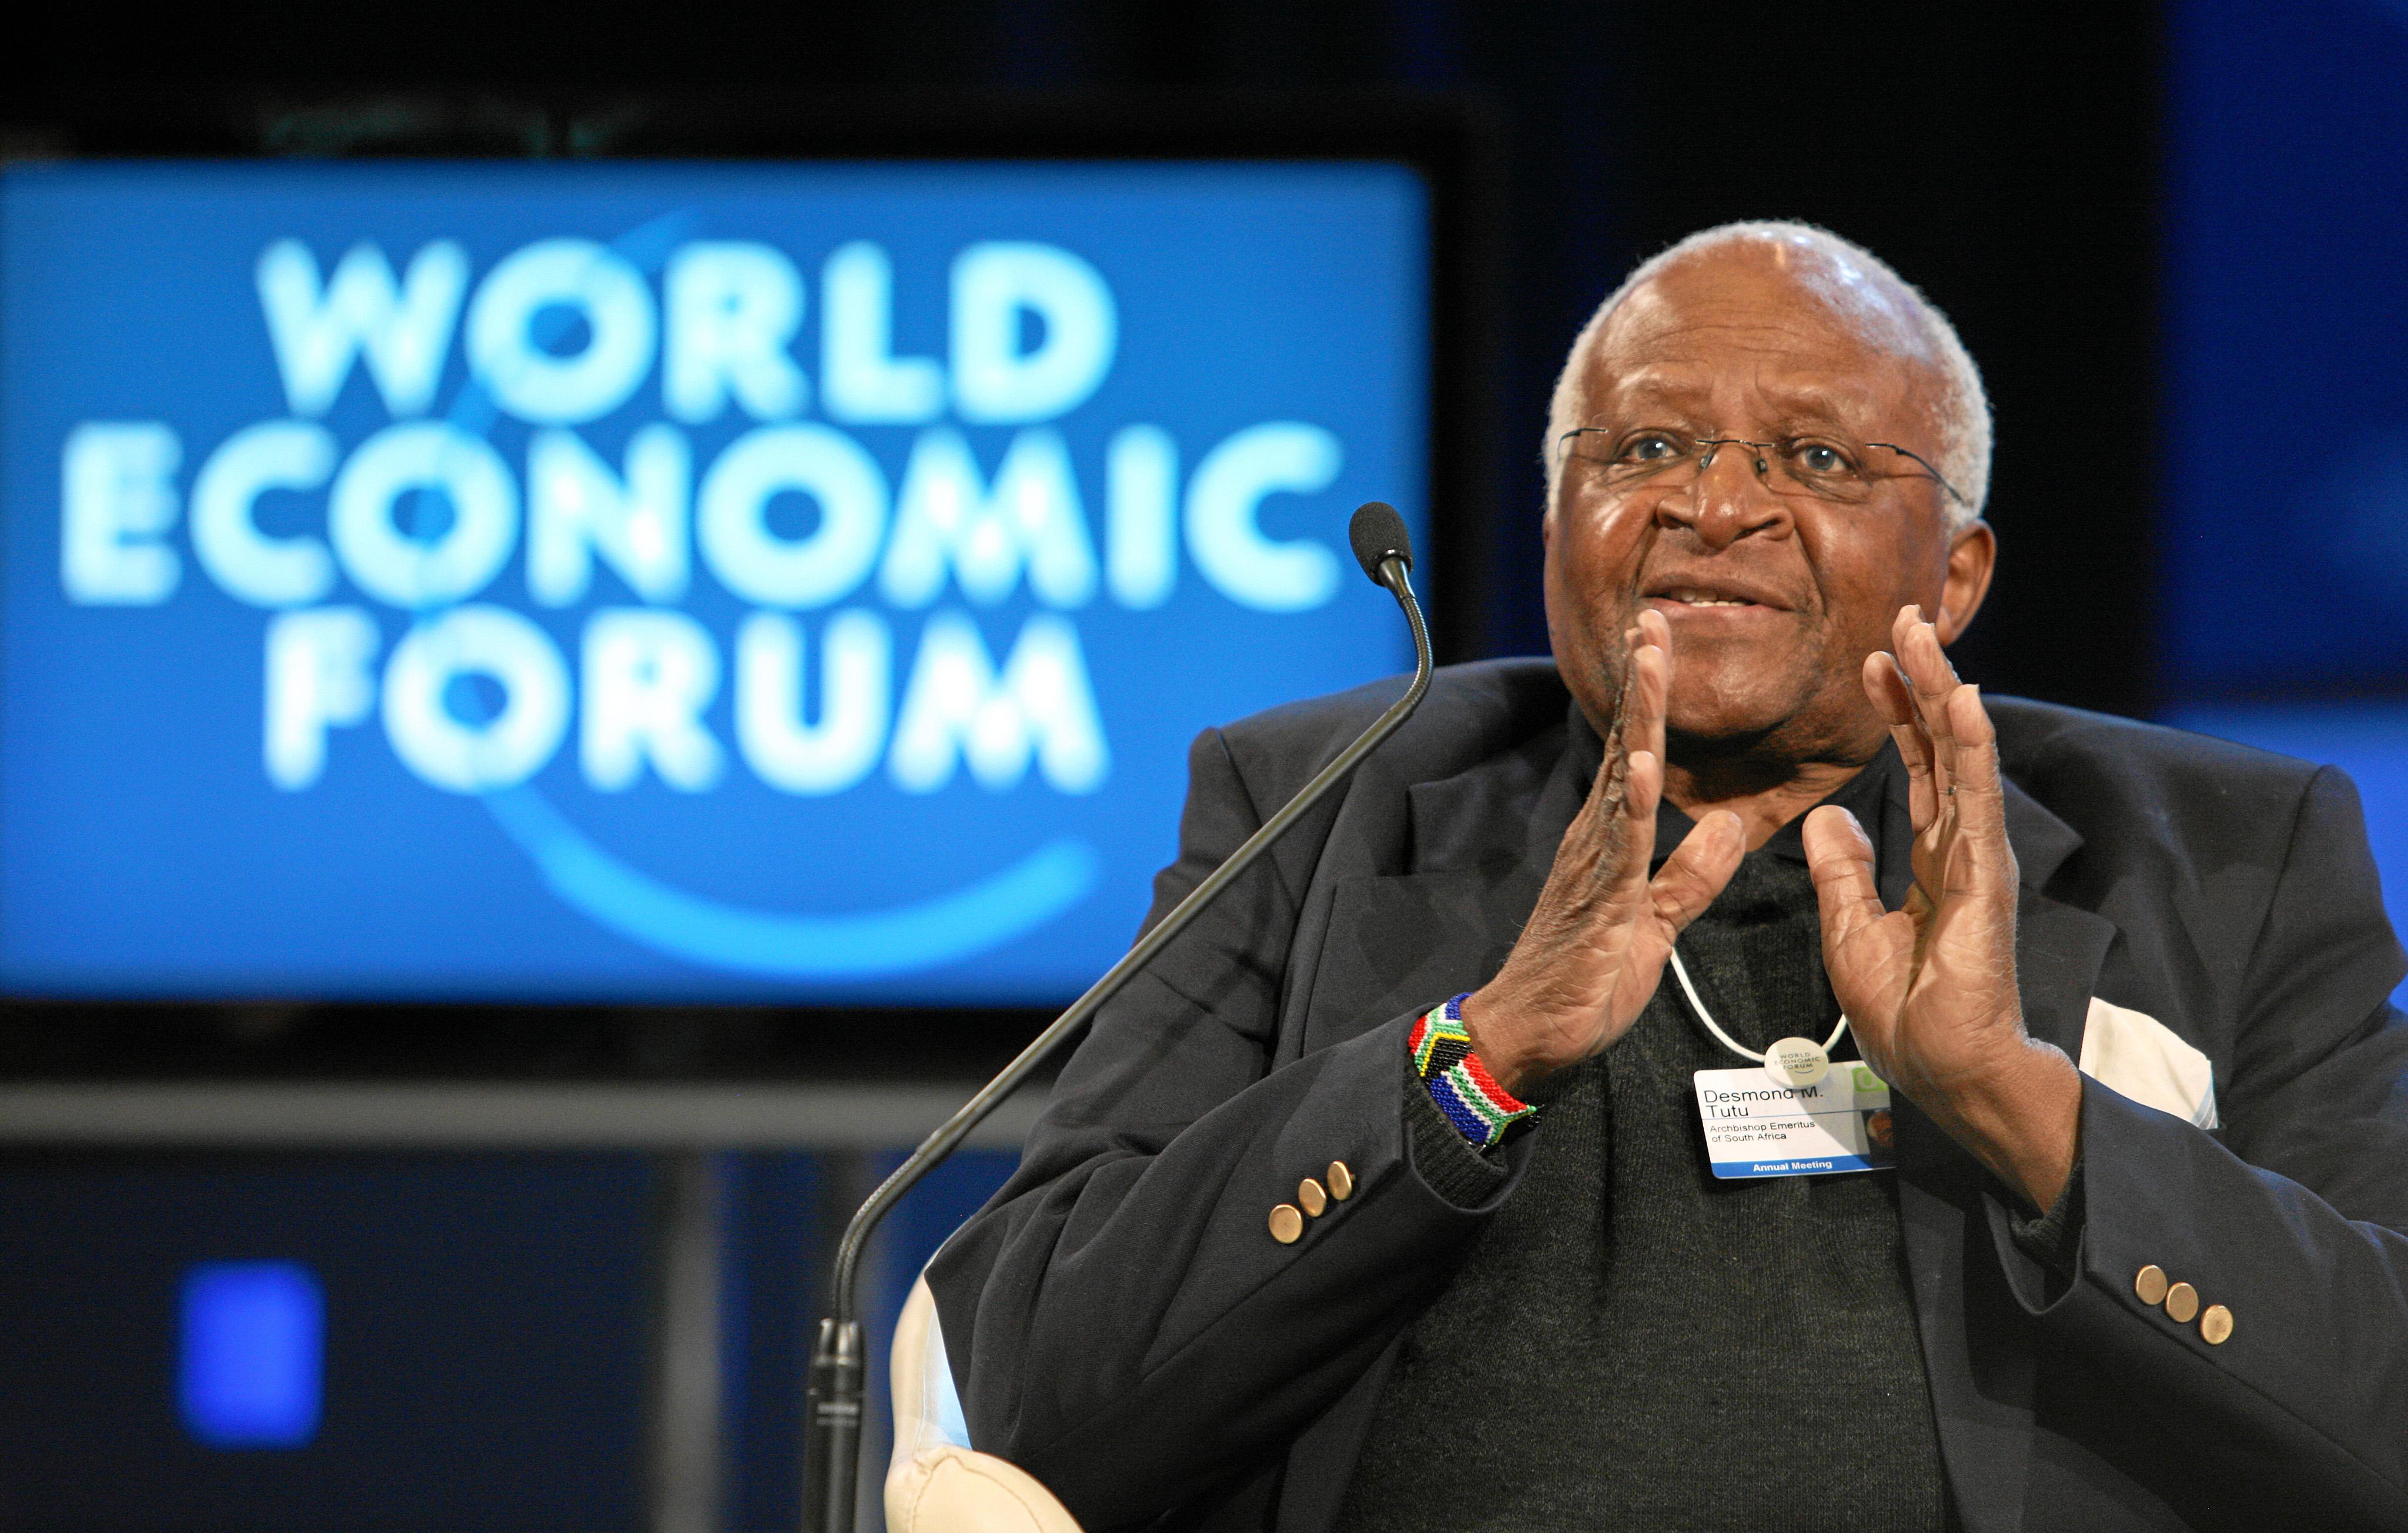 File:Desmond tutu wef.jpg - Wikimedia Commons